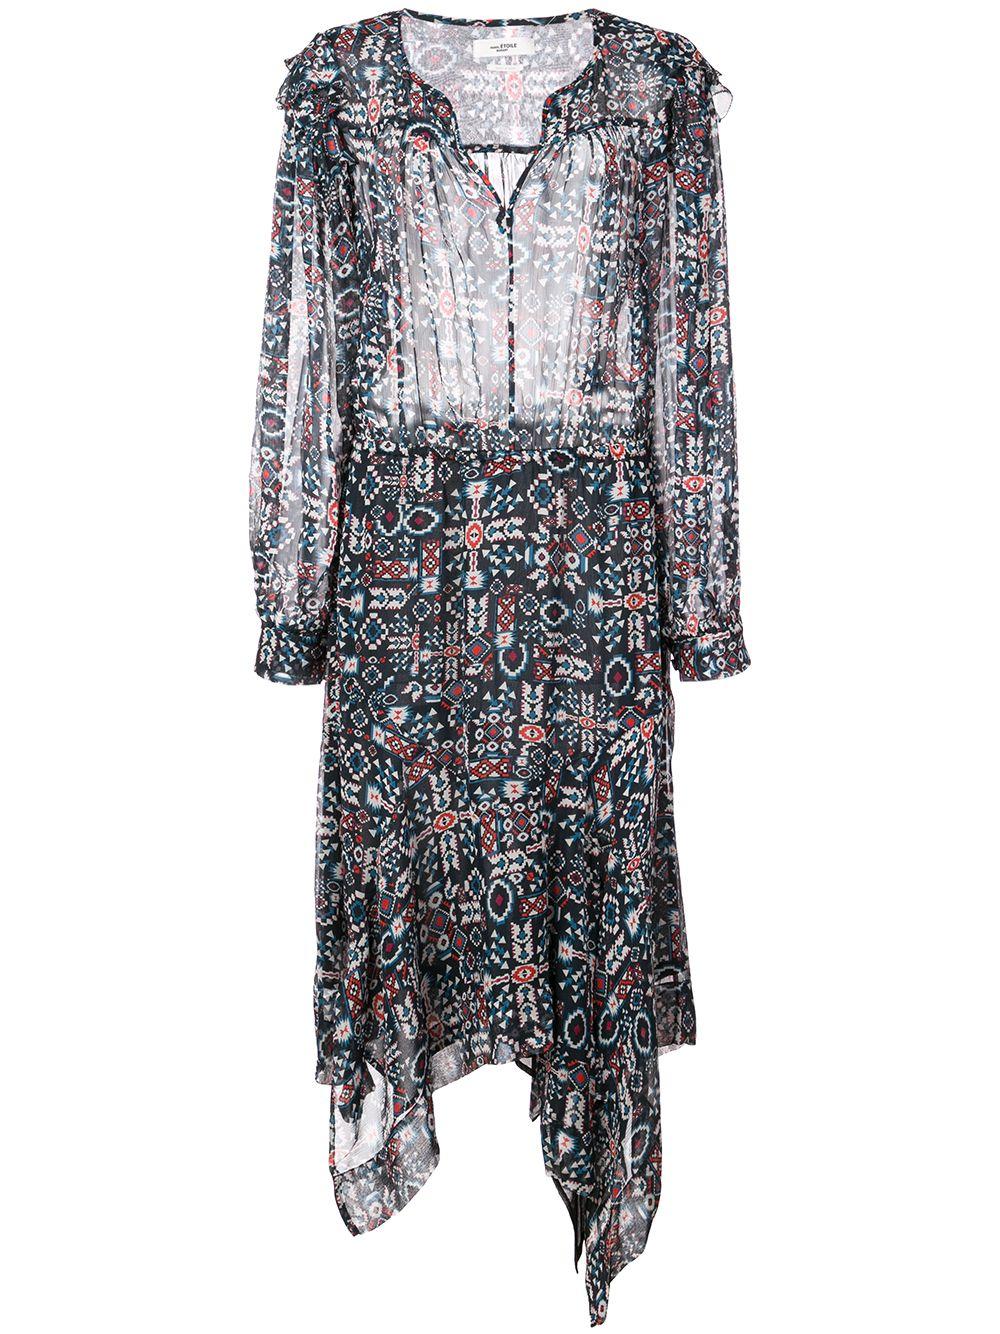 Isabel Marant Étoile | платье миди с ацтекским принтом | Clouty